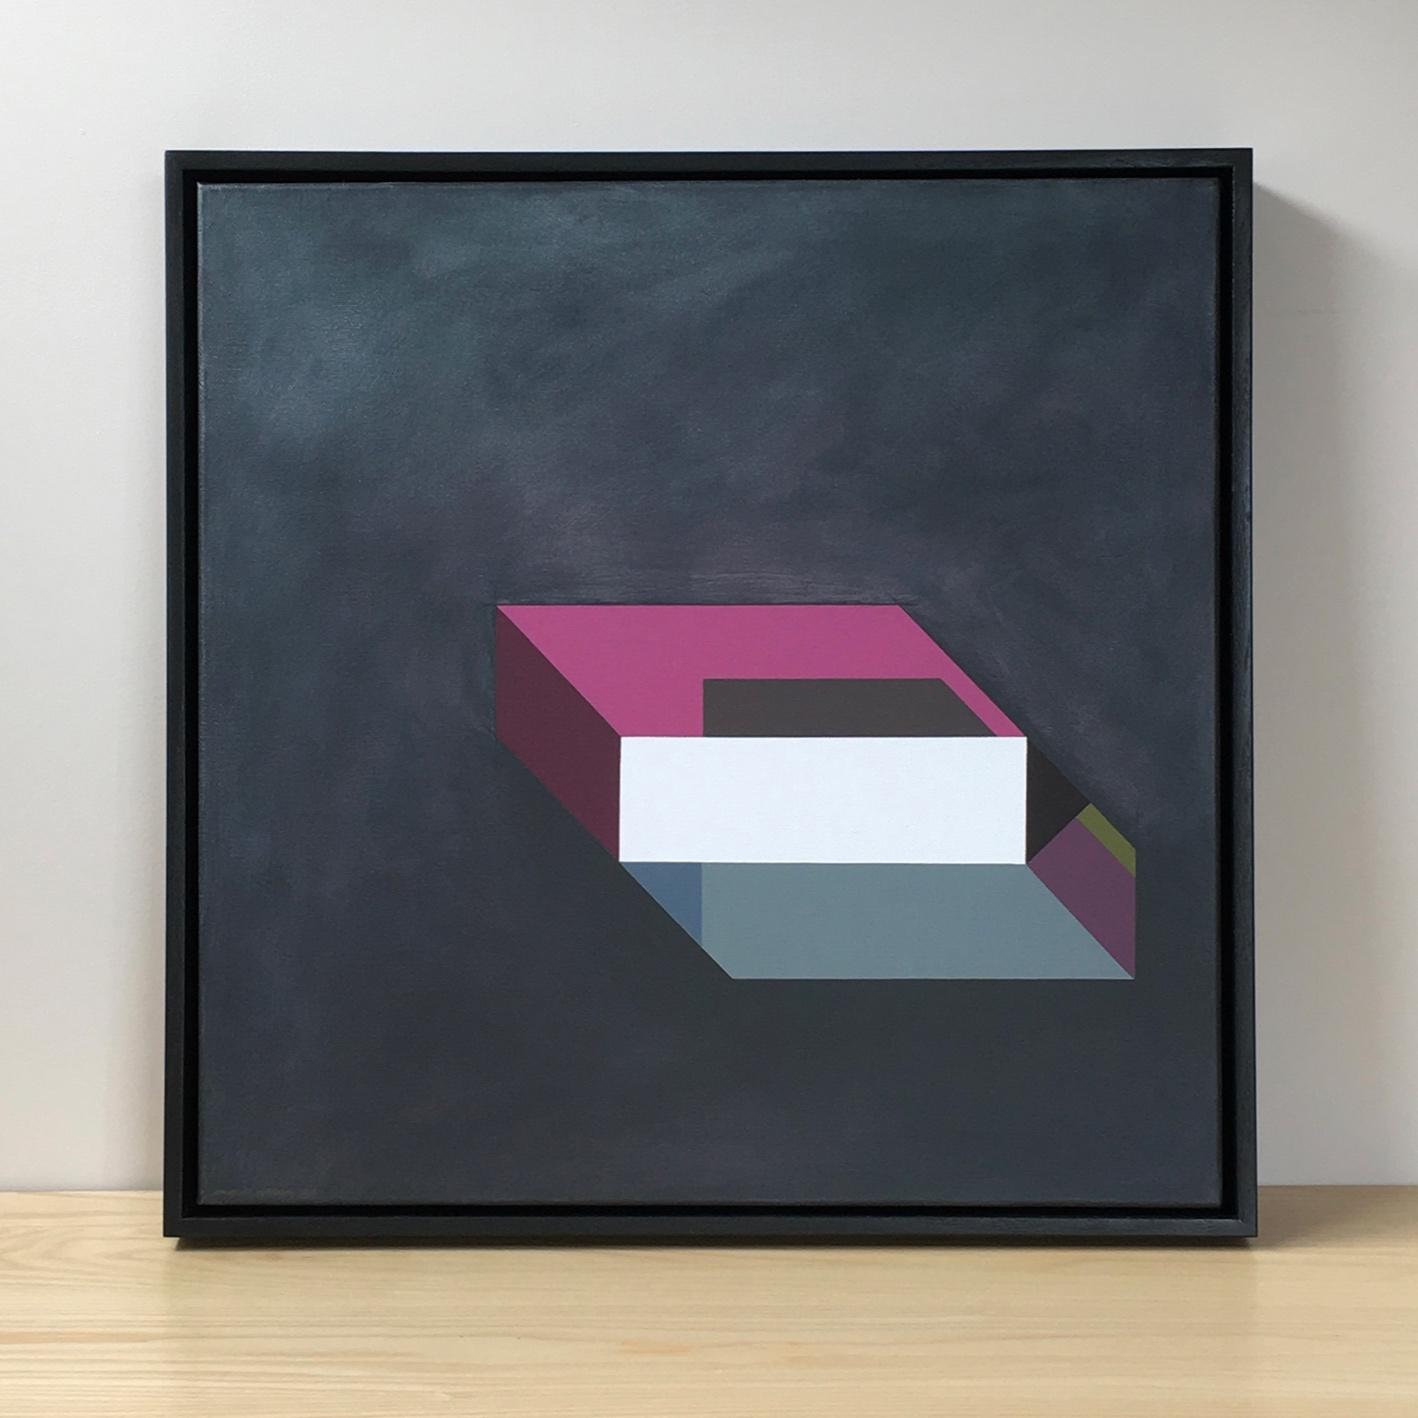 Roomy - original painting by Amanda Wilkinson